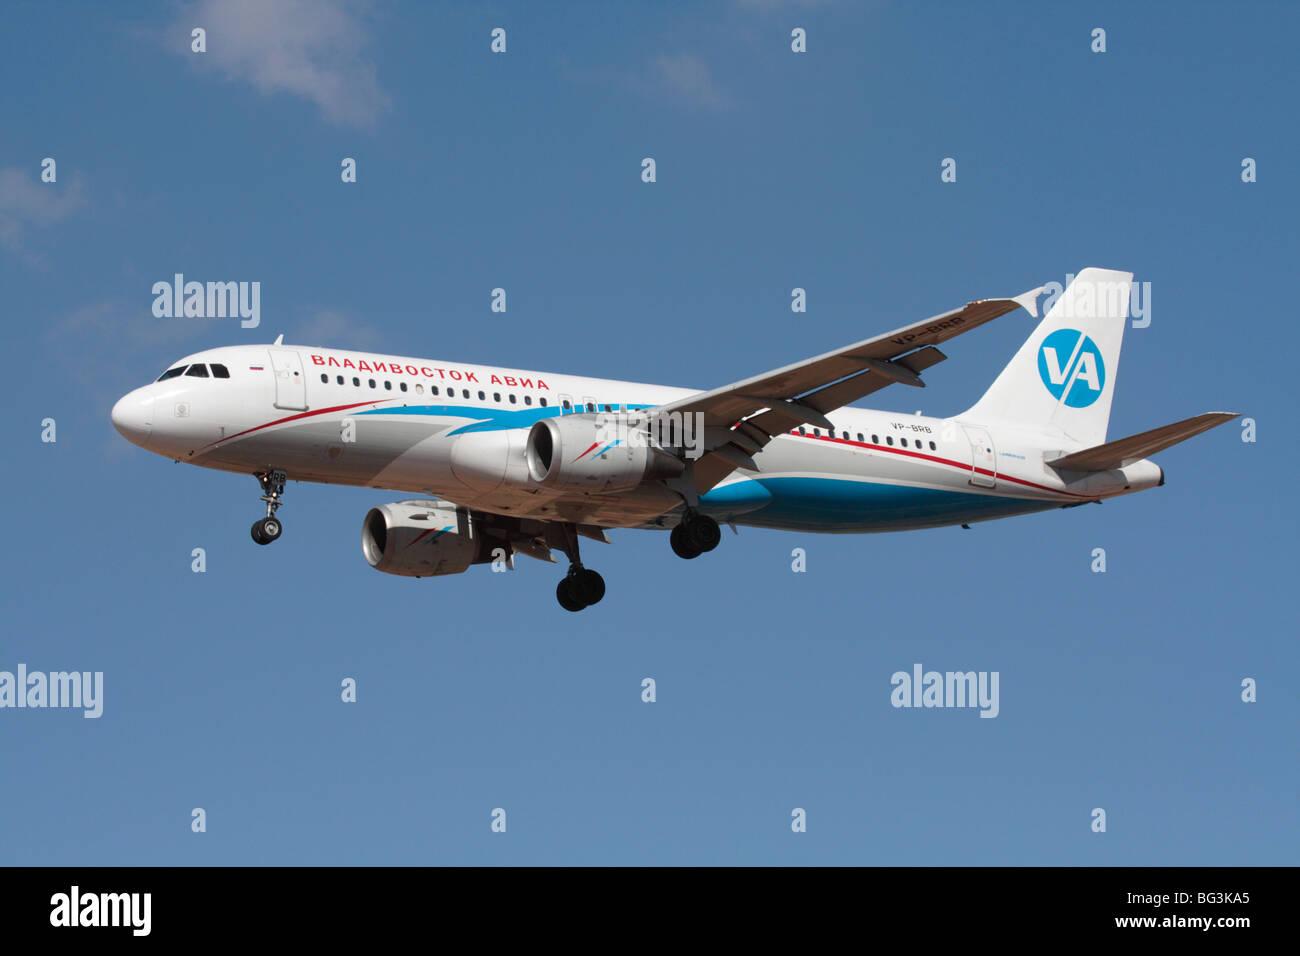 Vladivostok Avia Airbus A320 commercial passenger jet plane - Stock Image